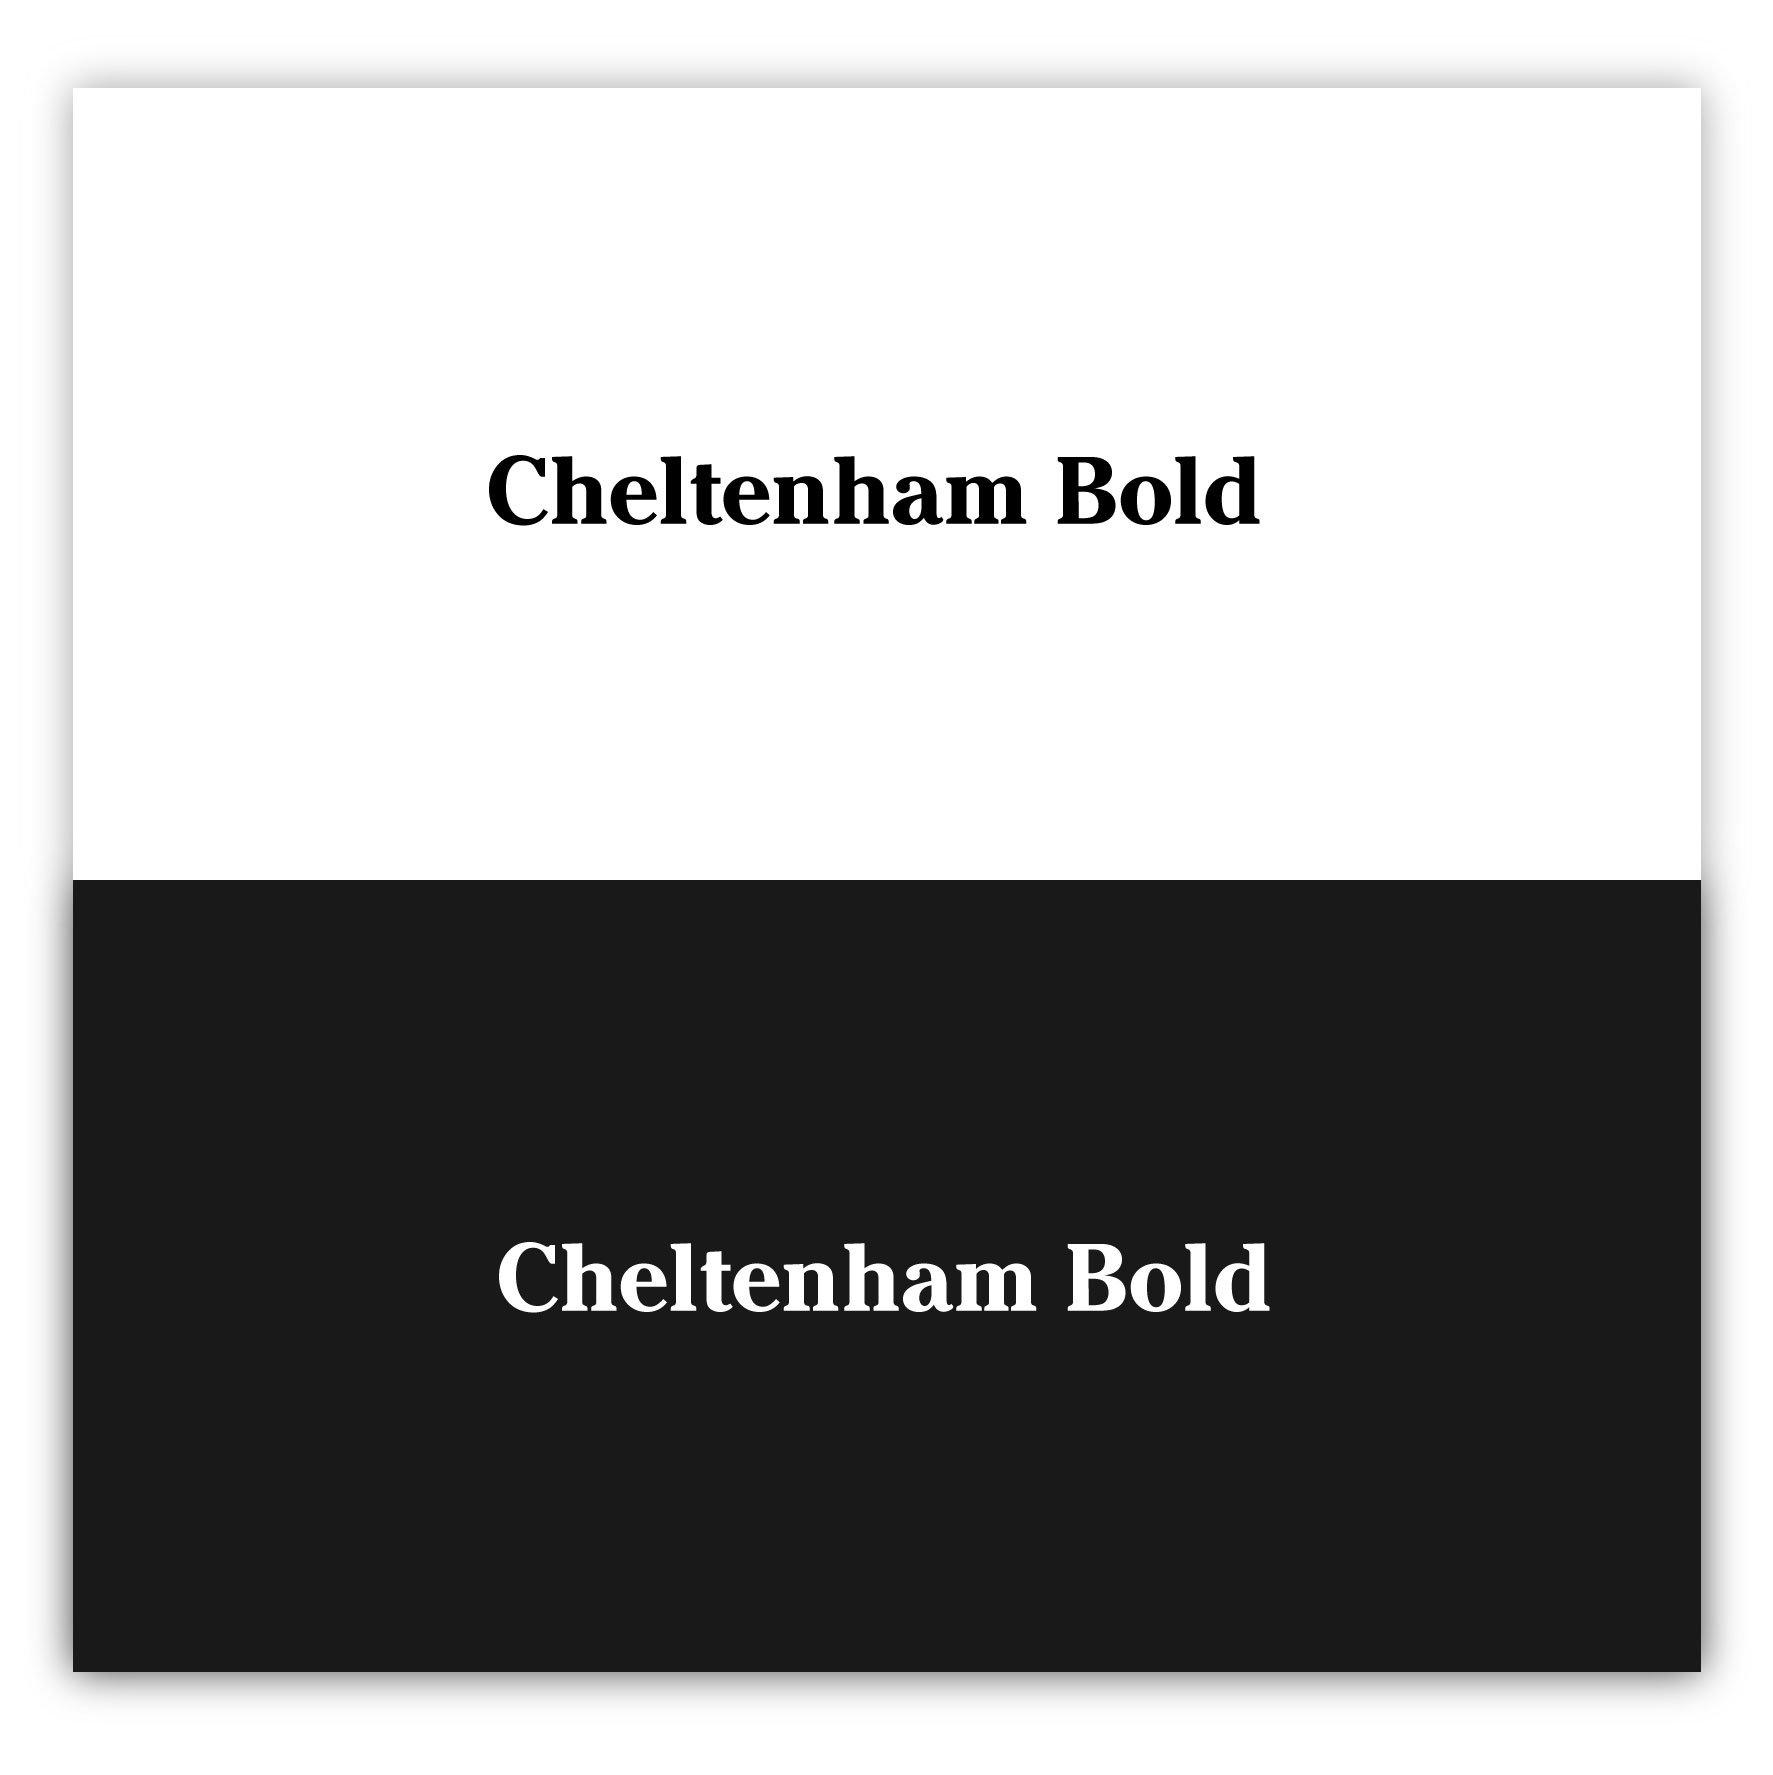 2020 Serif Fonts - modern fonts for 2020